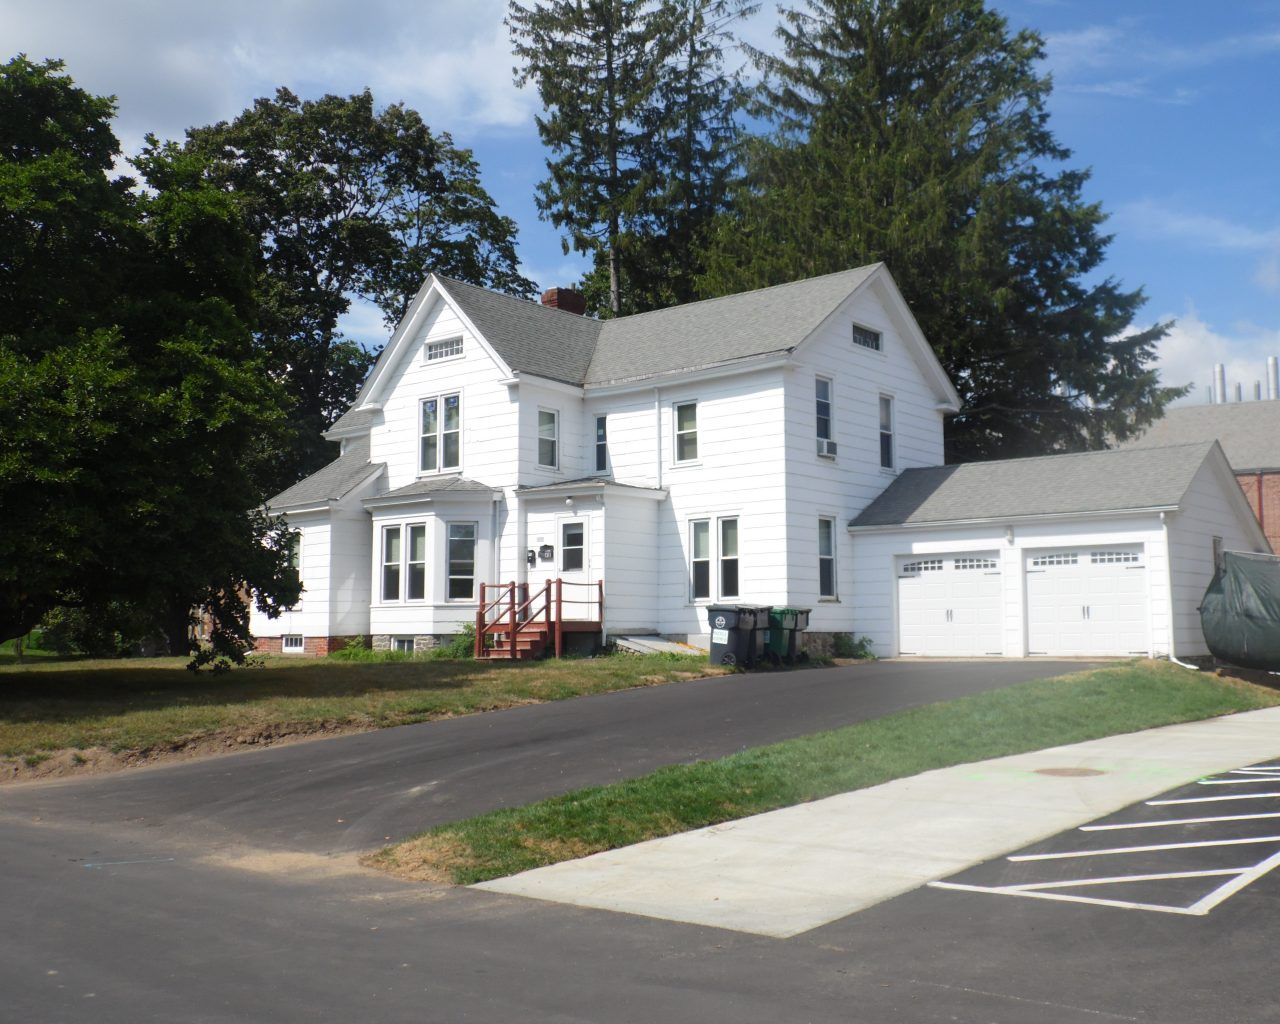 House 41